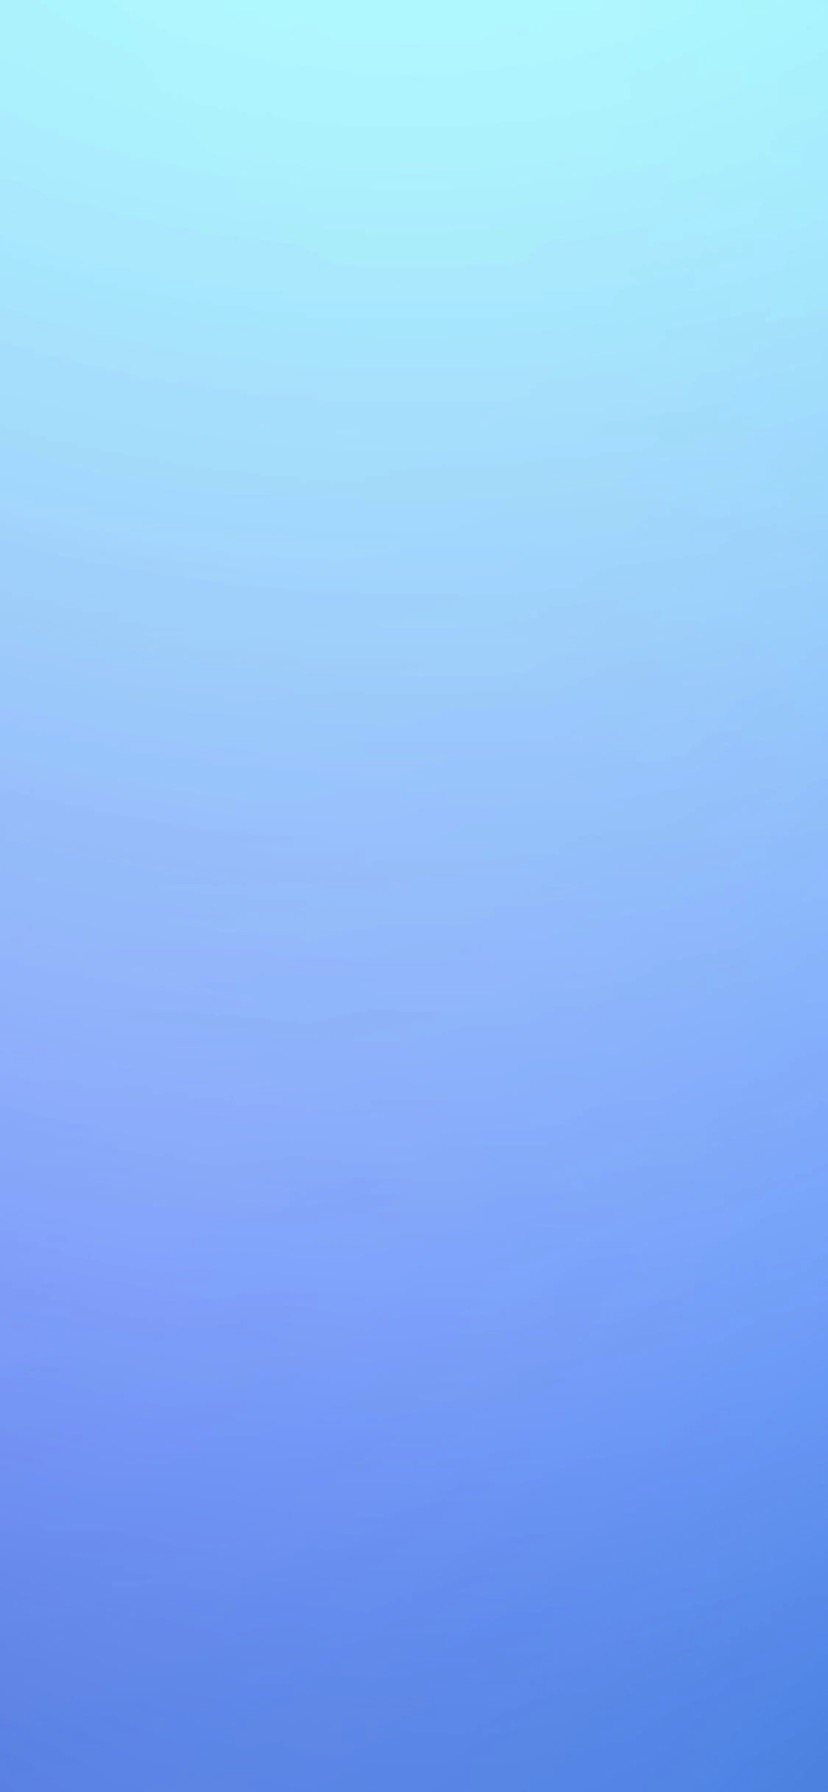 iPhone XR 壁紙 wallpaper 0122